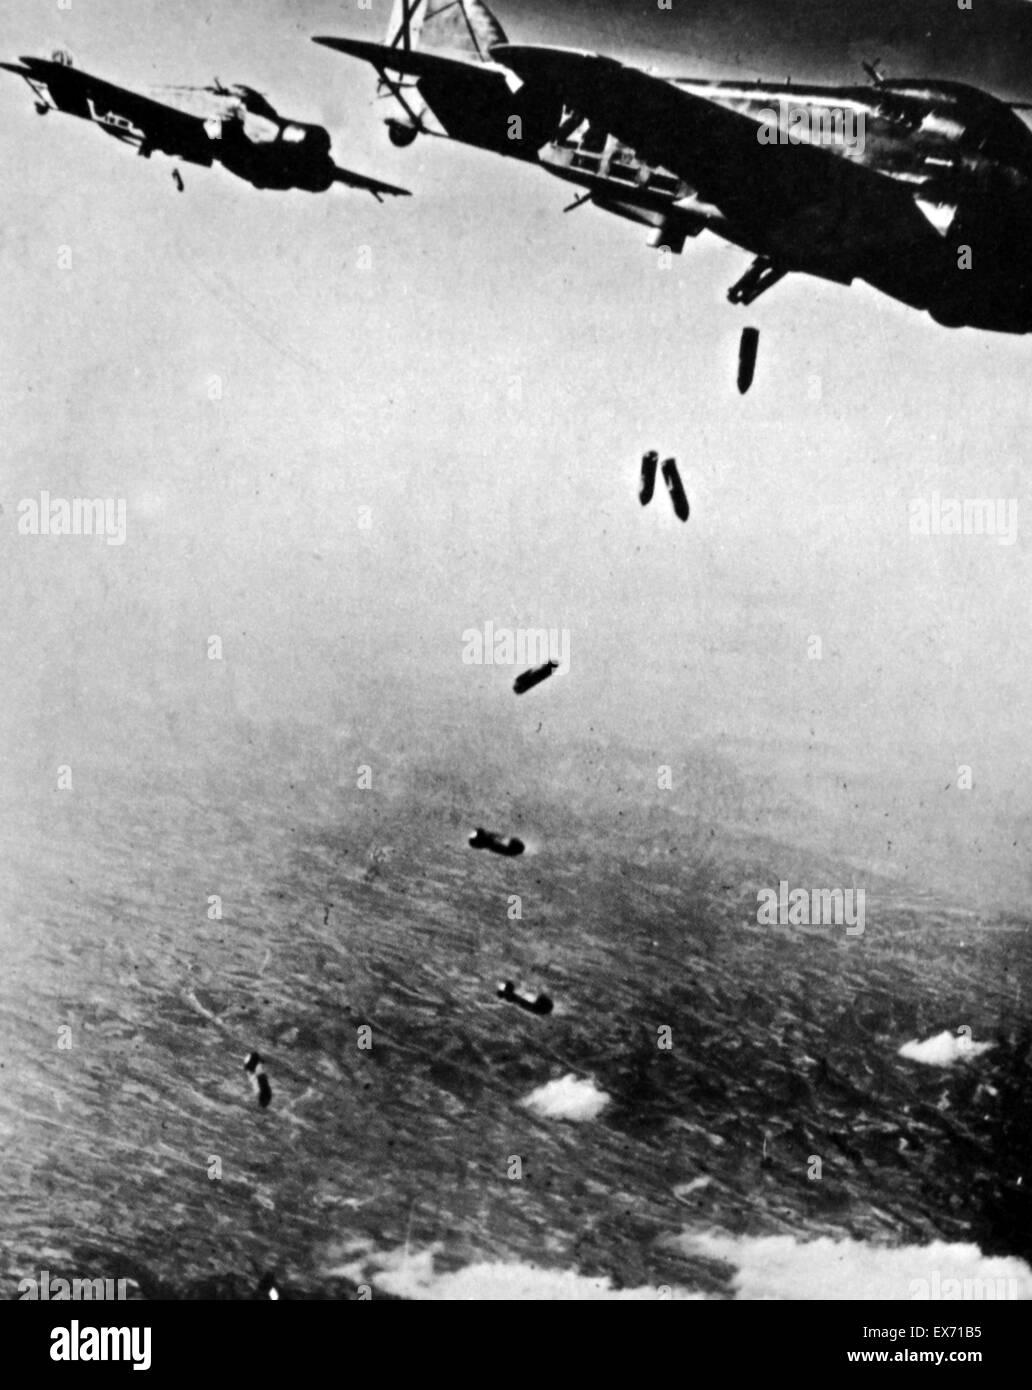 Spanish civil war, Italian aircraft bomb Republican positions in Spain - Stock Image